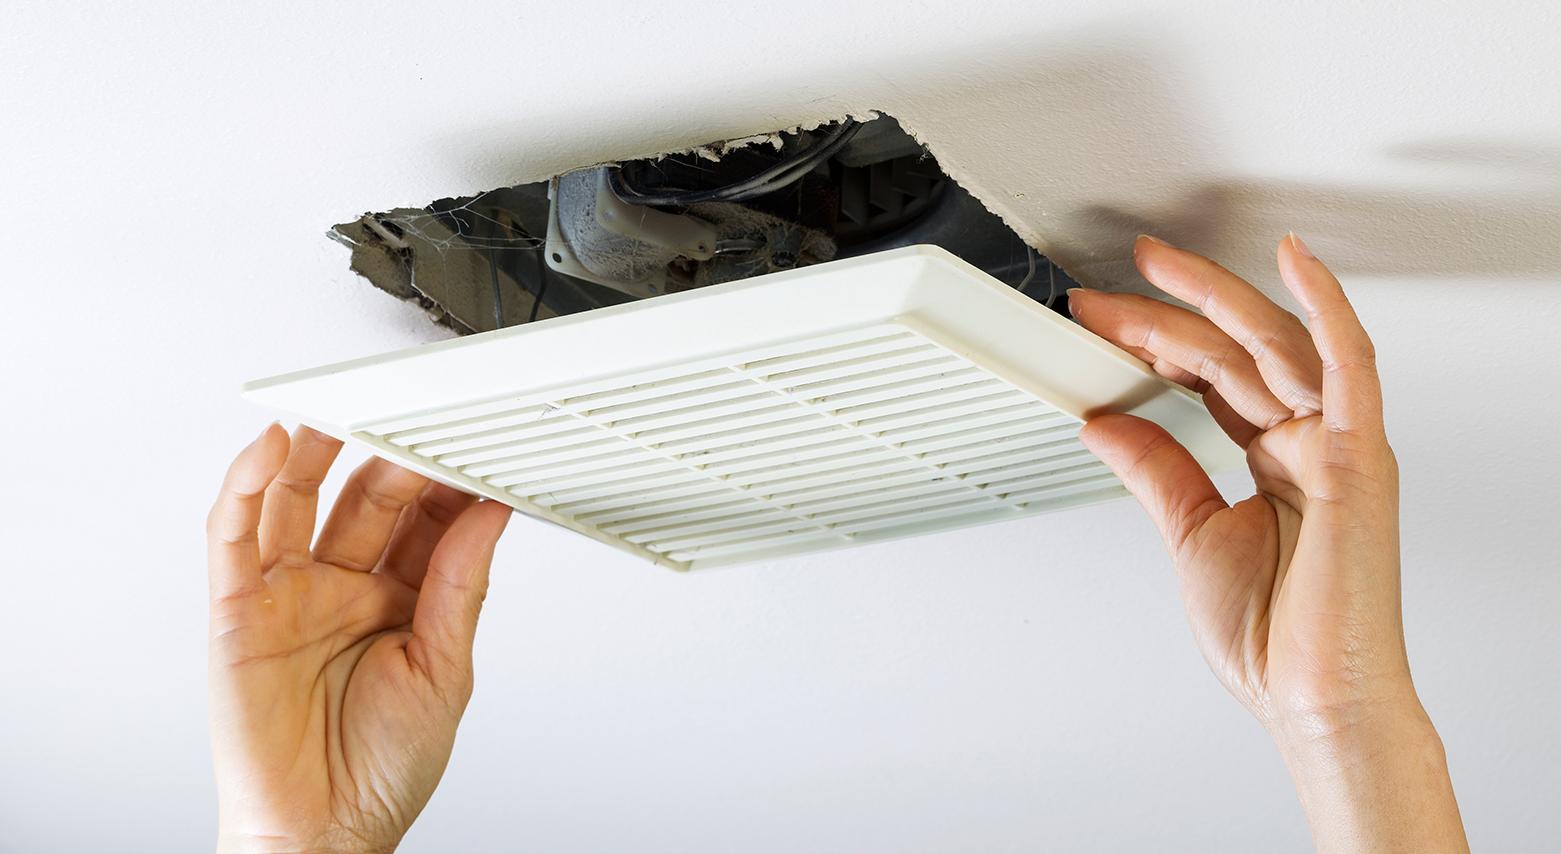 How to troubleshoot a noisy bathroom fan.